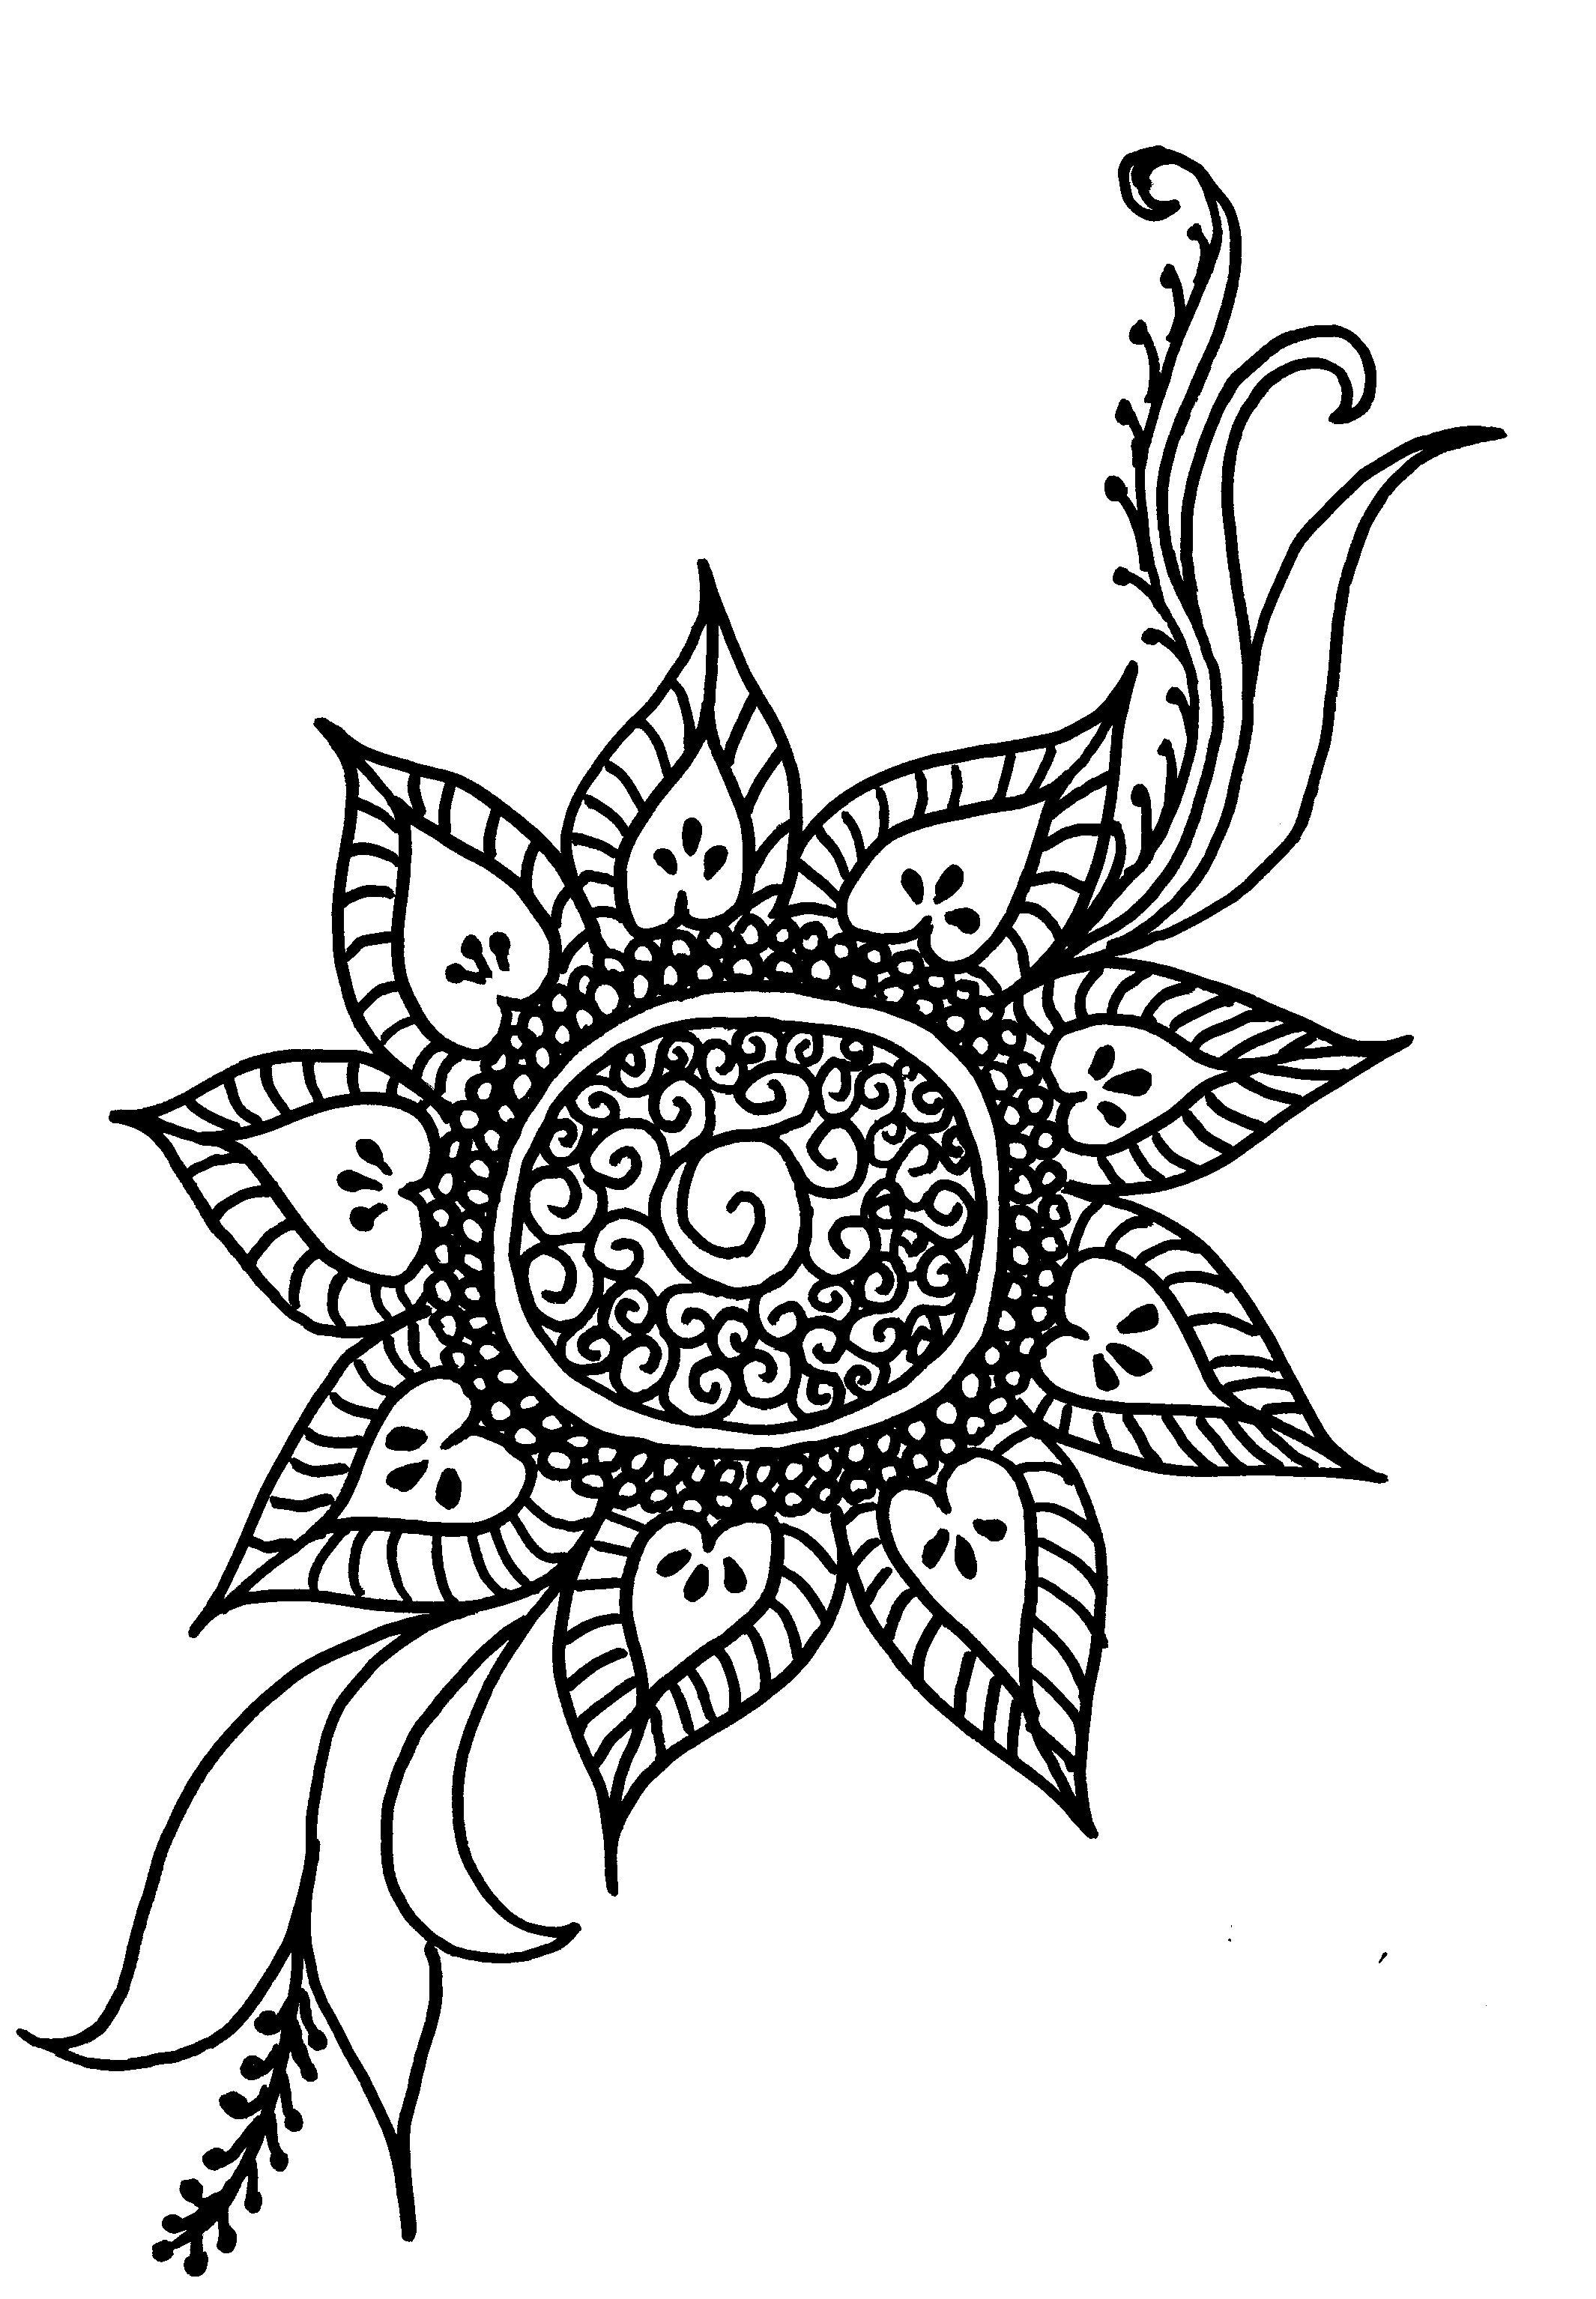 Sunflower005 Art Journal Henna Henna Designs Tattoos